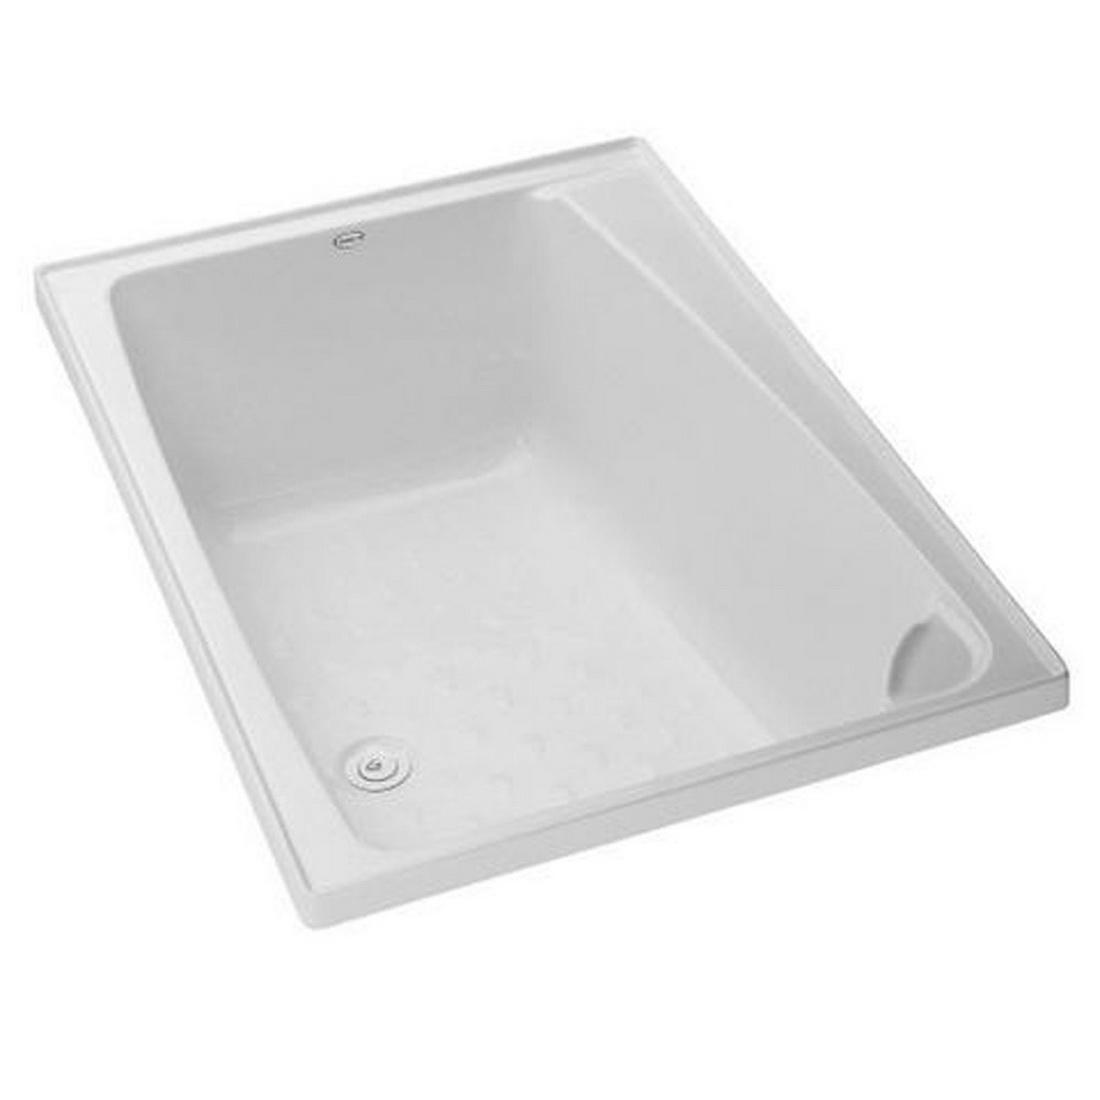 Compact Rectangular Bathtub 1200 x 820 x 440mm White 120000006